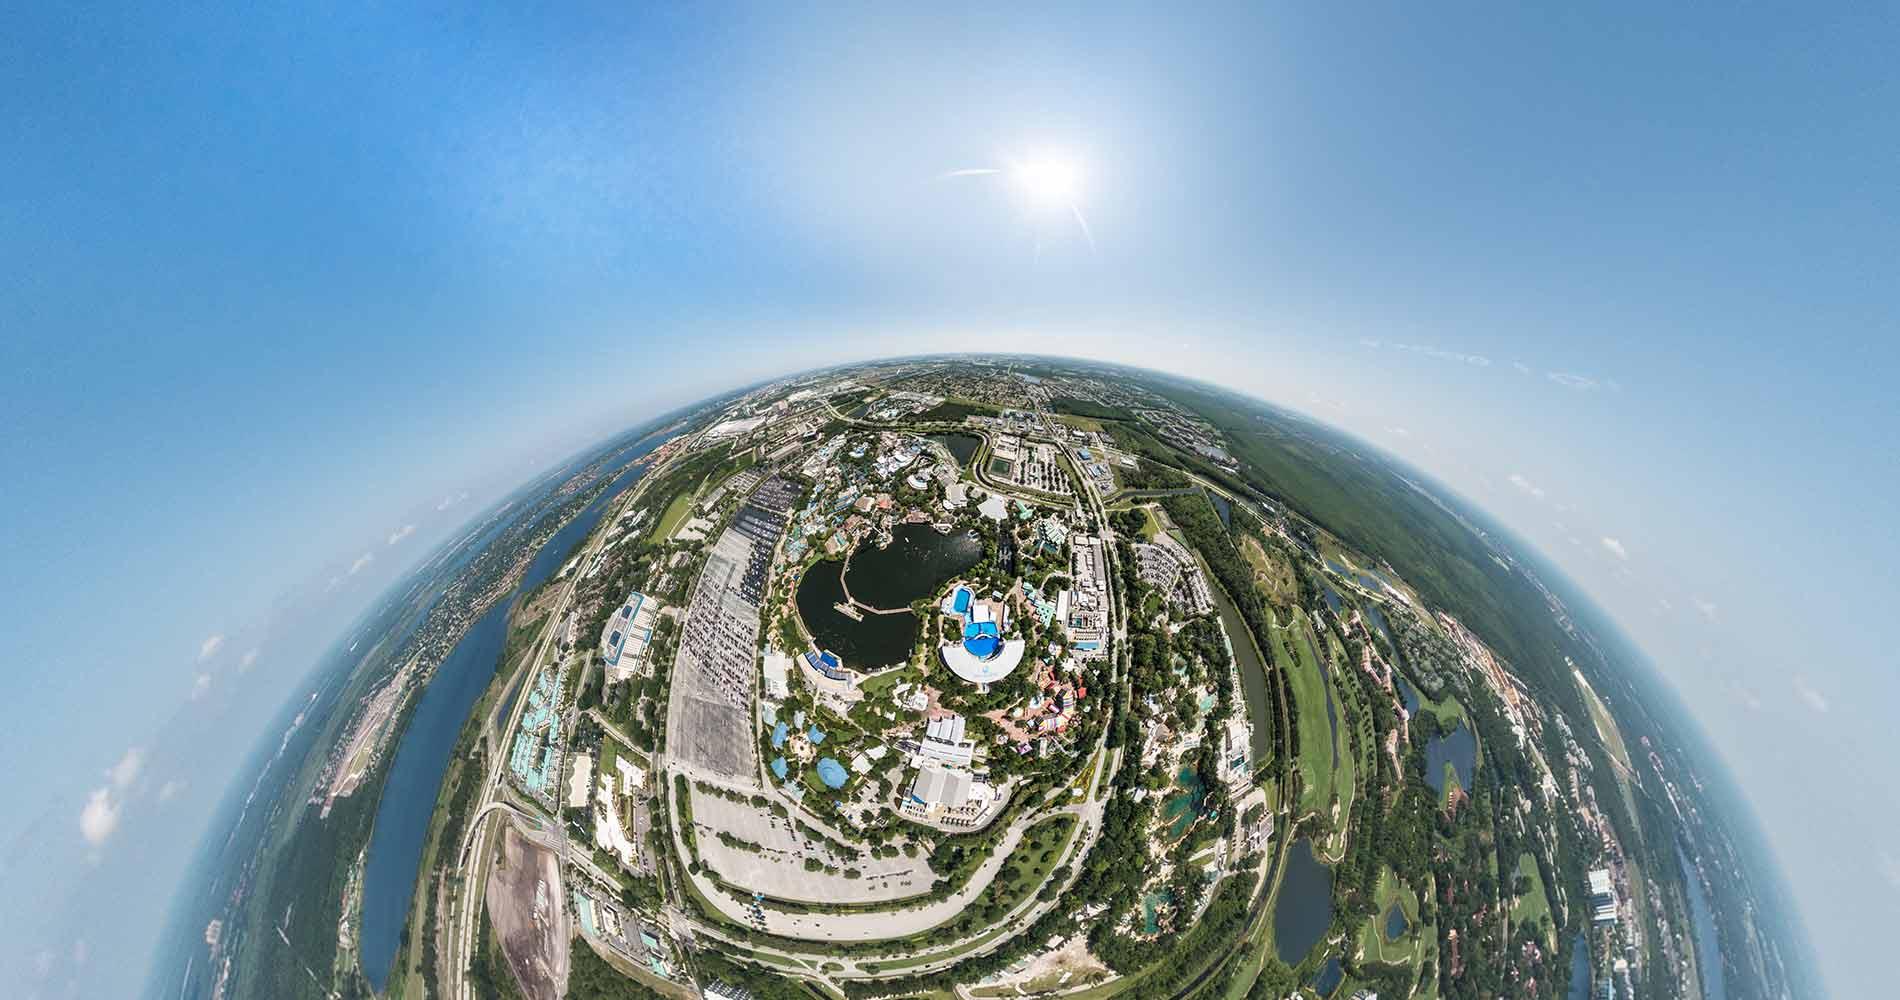 A sneak peek of Orlando and SeaWorld